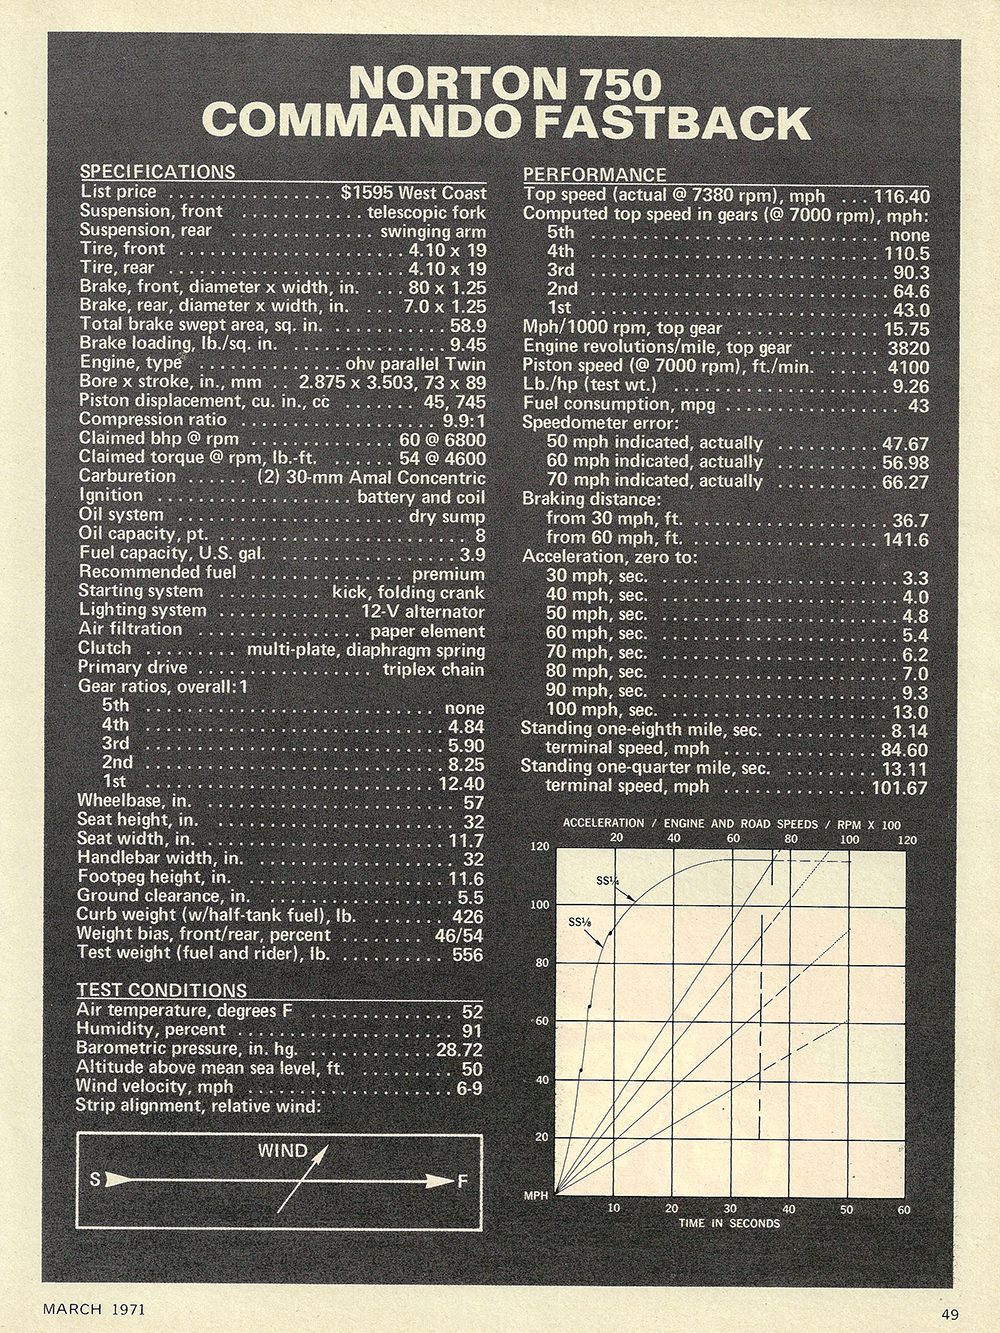 1971 Norton 750 Commando Fastback road test 04.jpg